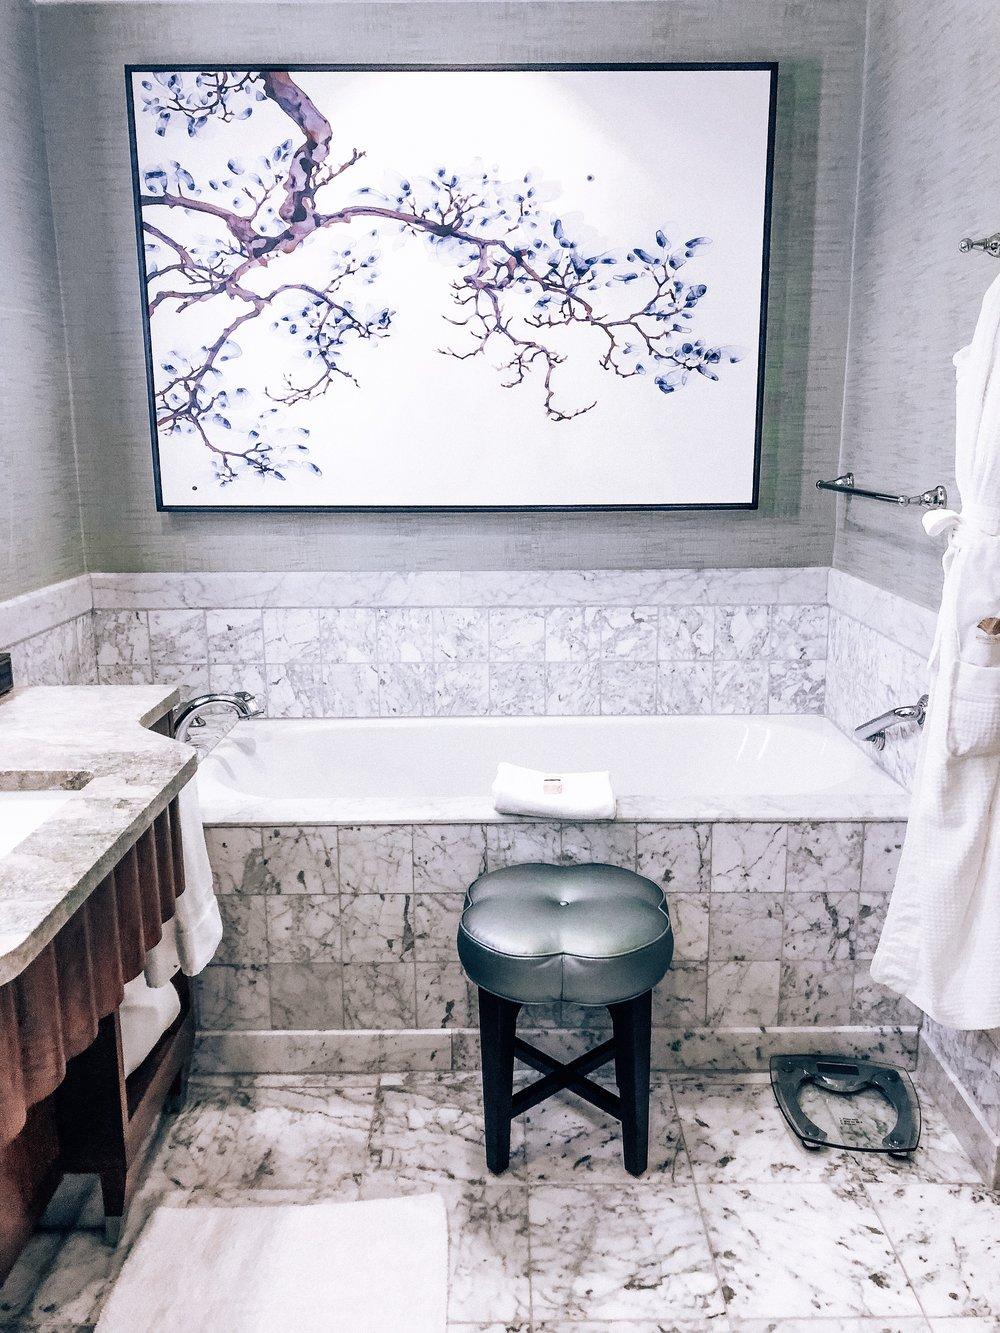 Marbled bathroom and tub